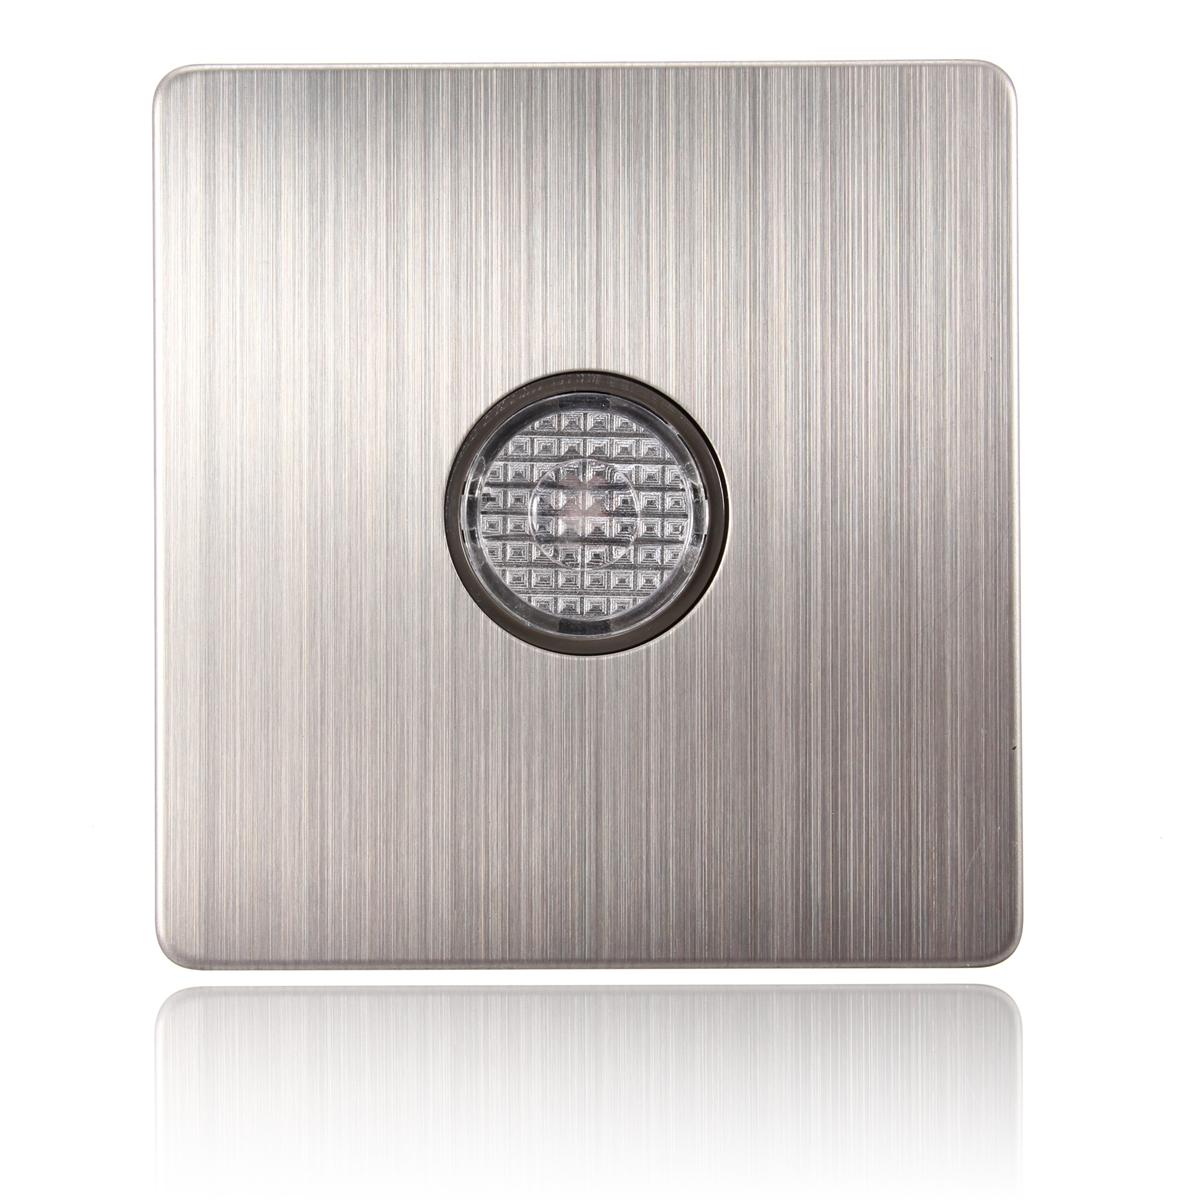 220v wall mount voice light sensor detector switch sound light detail image aloadofball Image collections